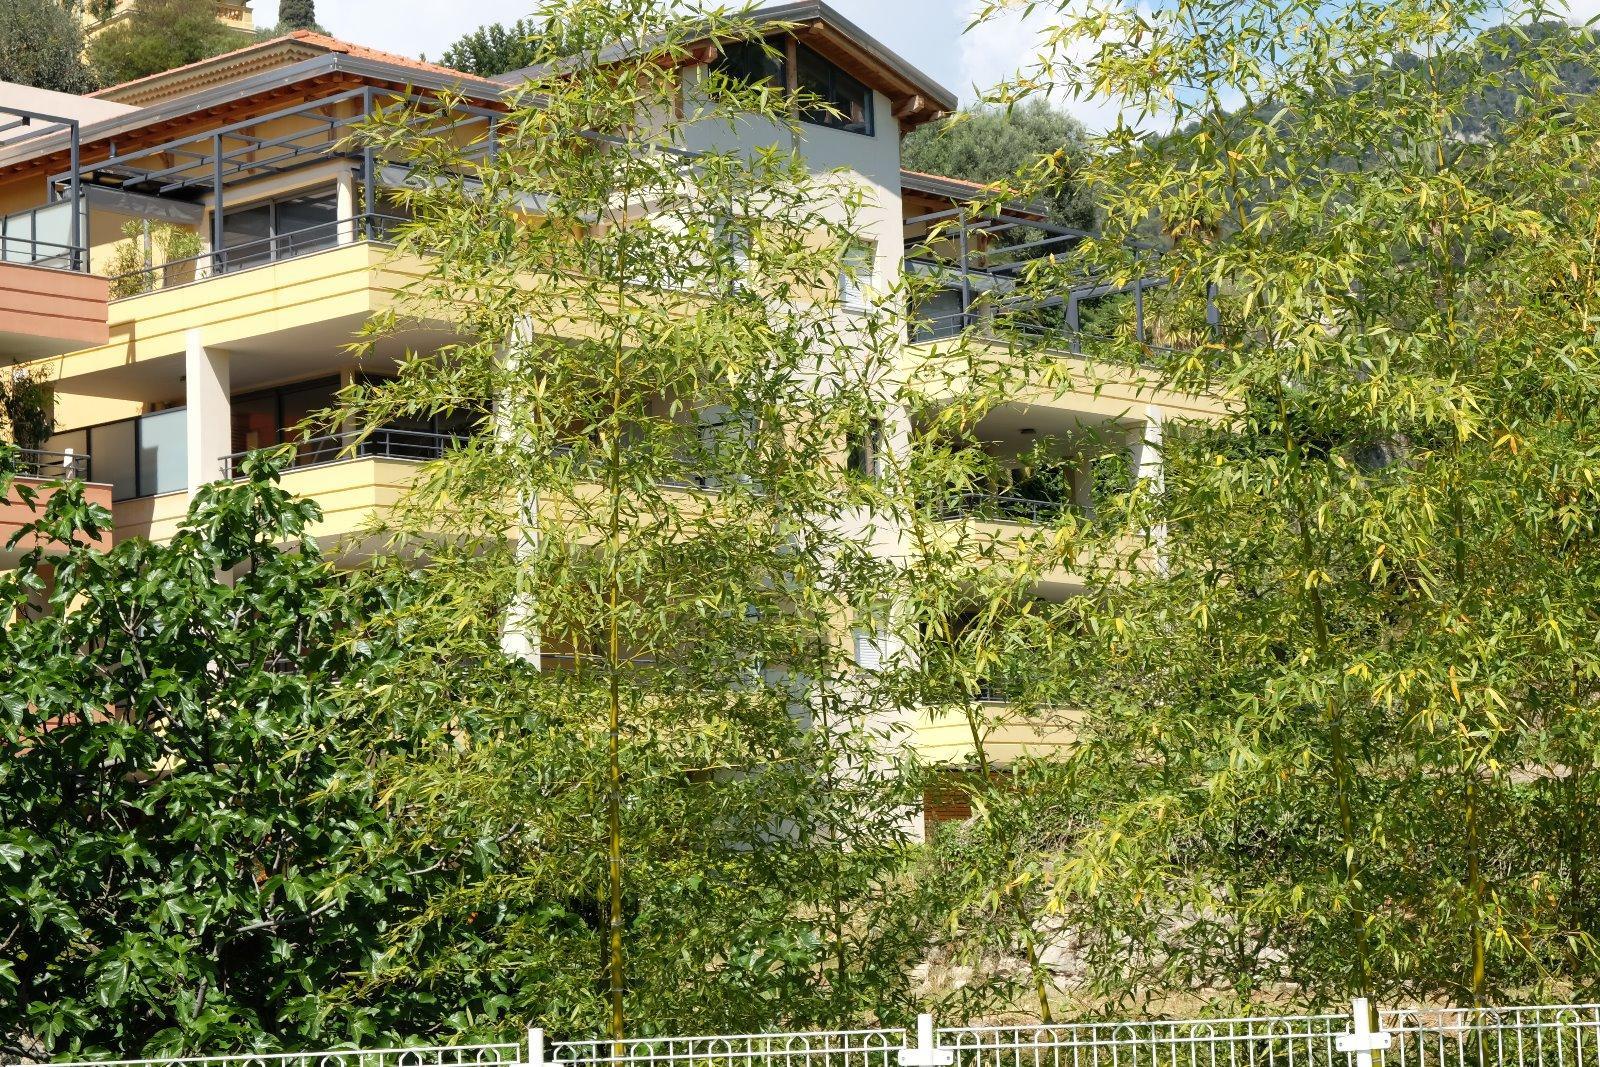 vente menton garavan appart 4p 110m2 terrasse 60m2 jardin 140m2. Black Bedroom Furniture Sets. Home Design Ideas